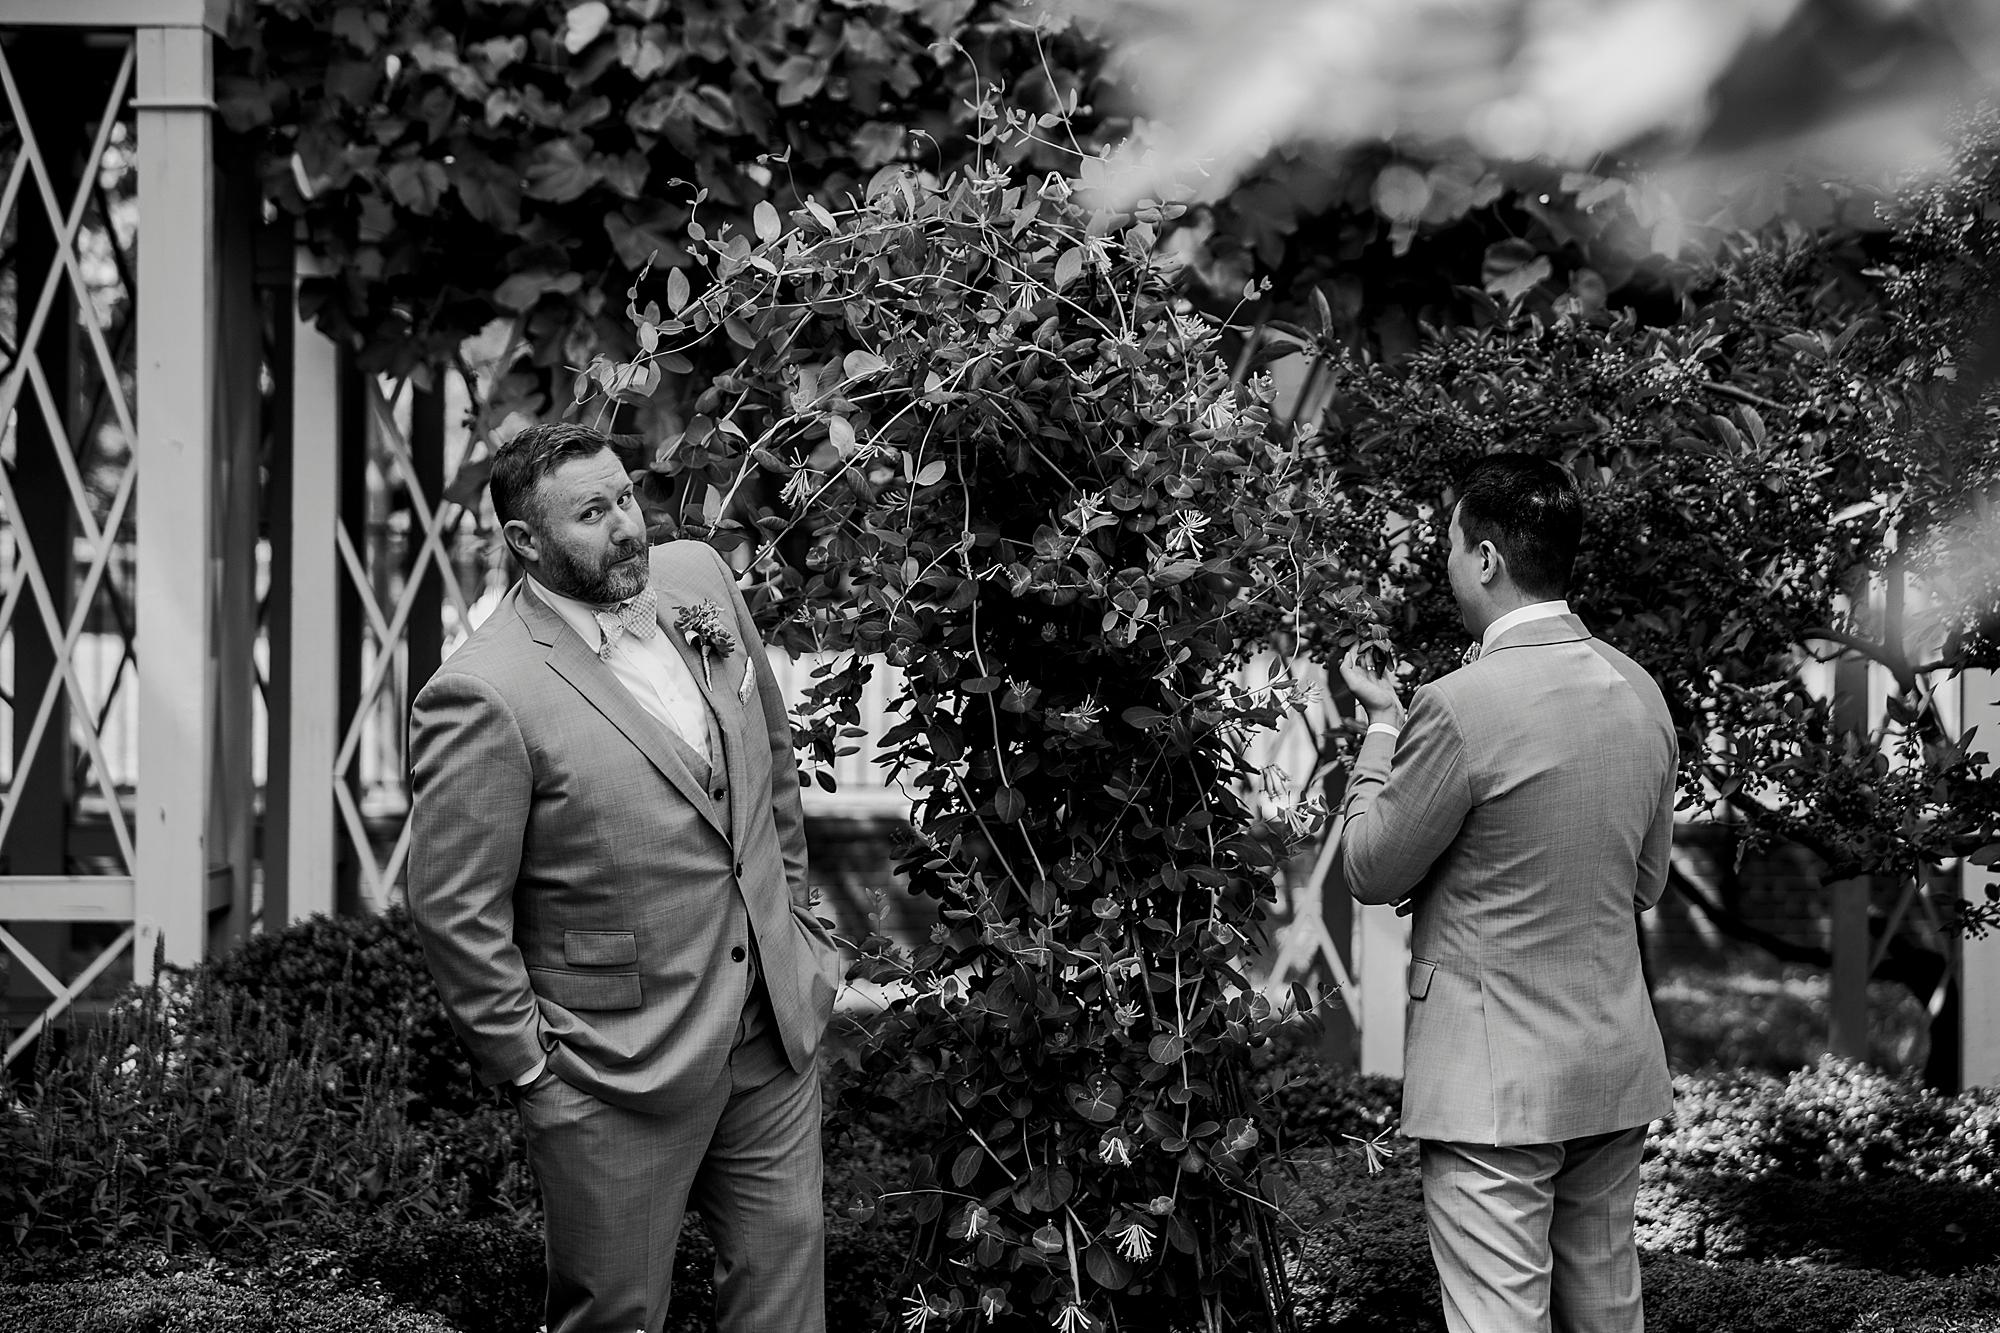 Dan_and_Byron_Love_by_Joe_Mac_Philadelphia_Wedding_LGBTQ_Photography_Gay_Independence_visitor_Center_39.JPG